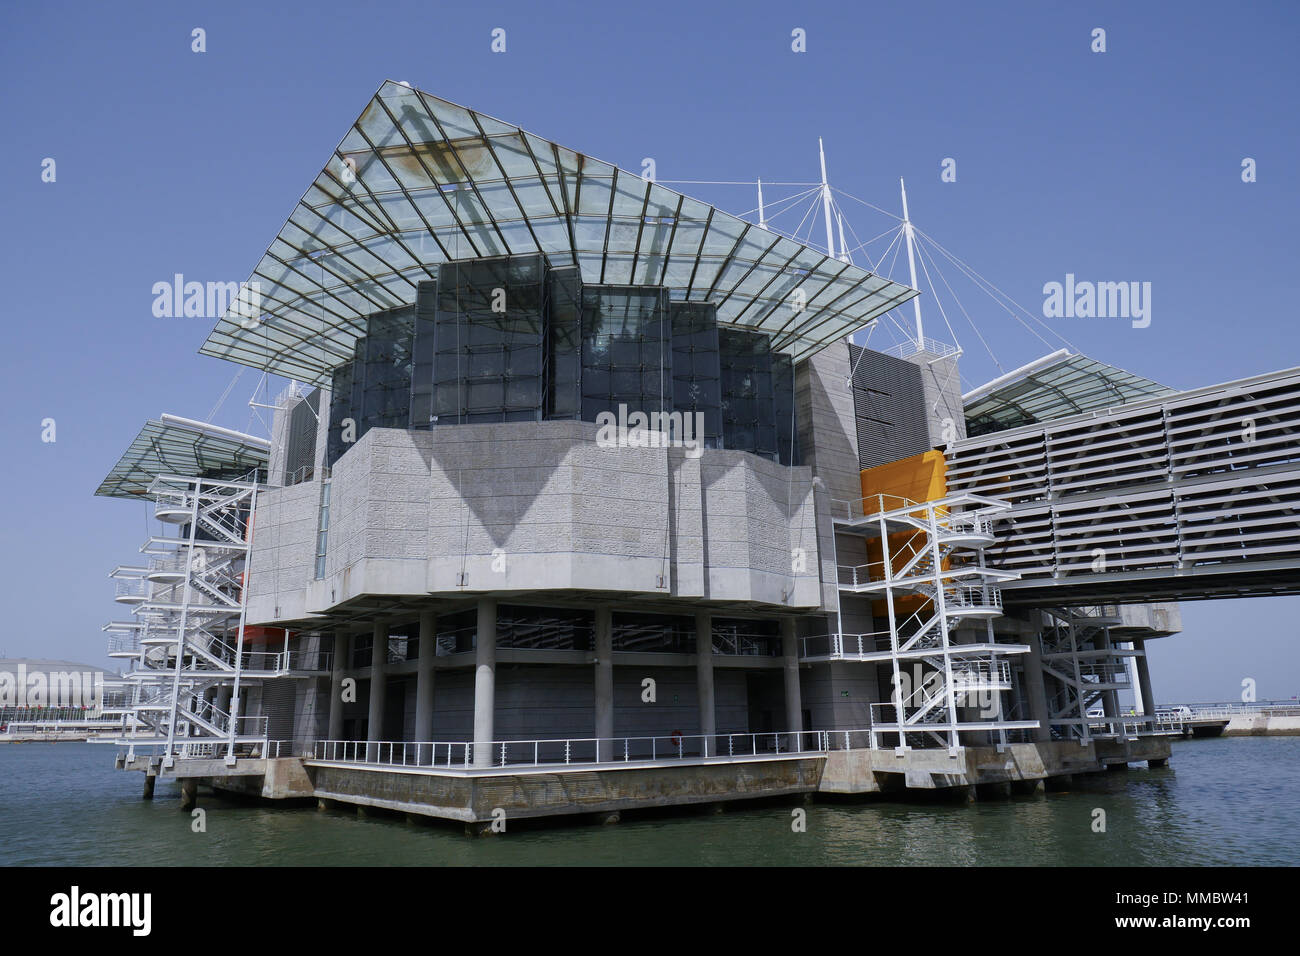 Aquarium, Park of the Nations, Lisbon, Portugal Stock Photo